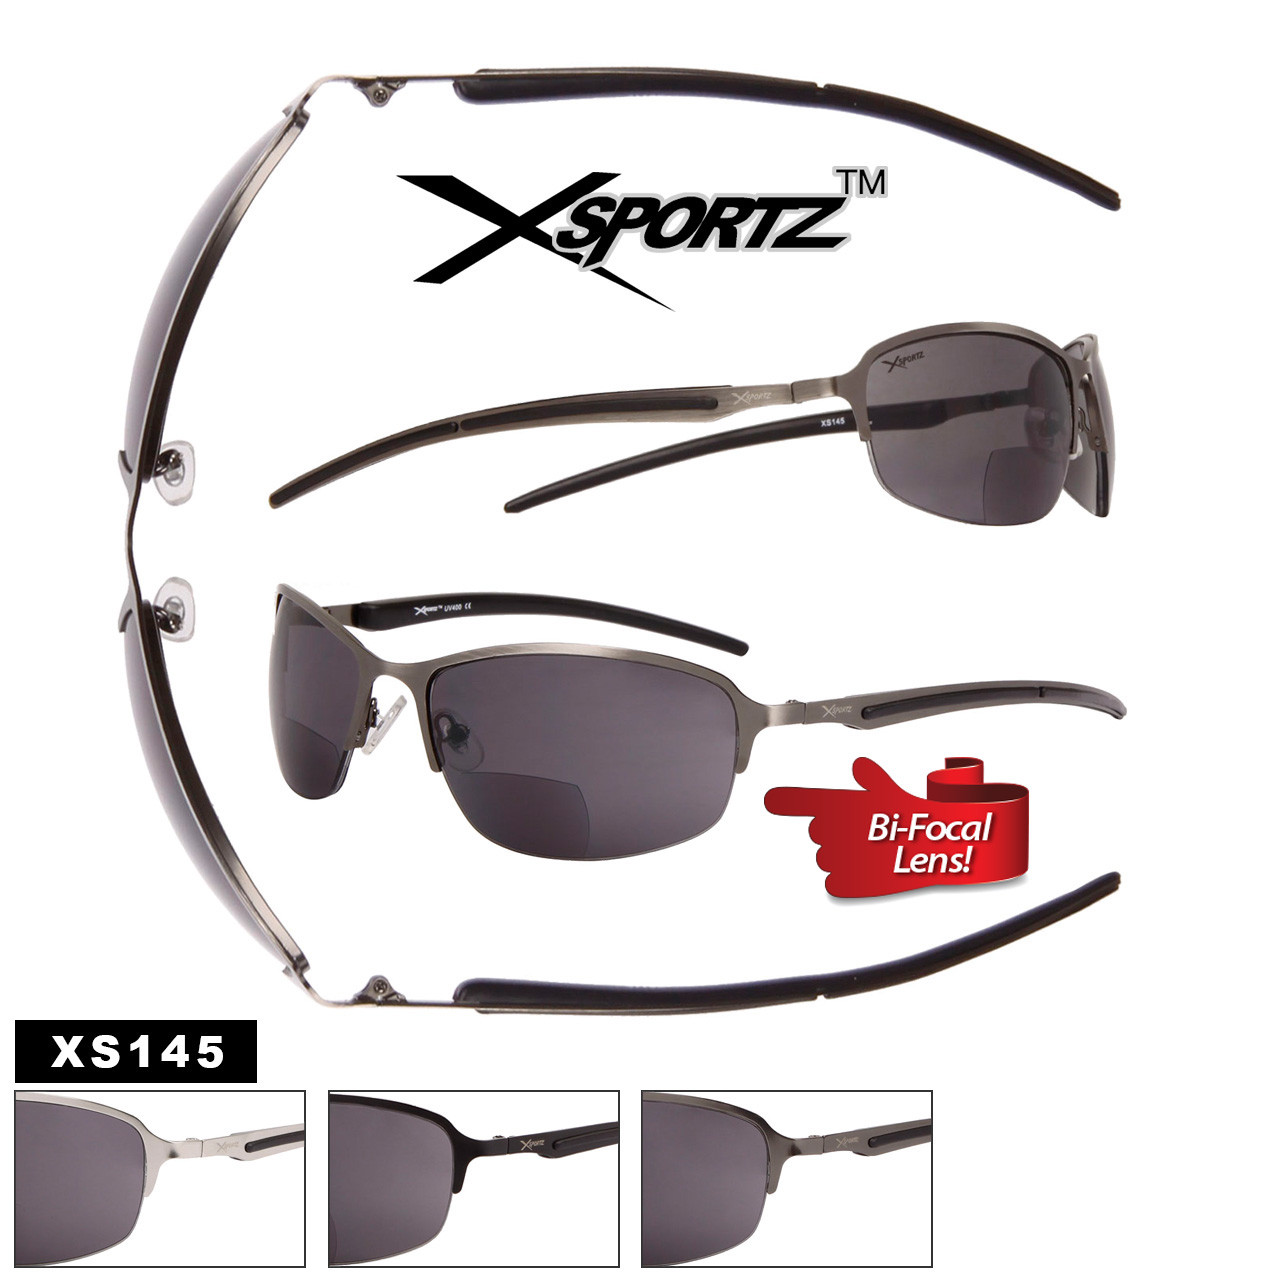 Xsportz™ Bi-Focal Sunglasses Wholesale - Style #XS145